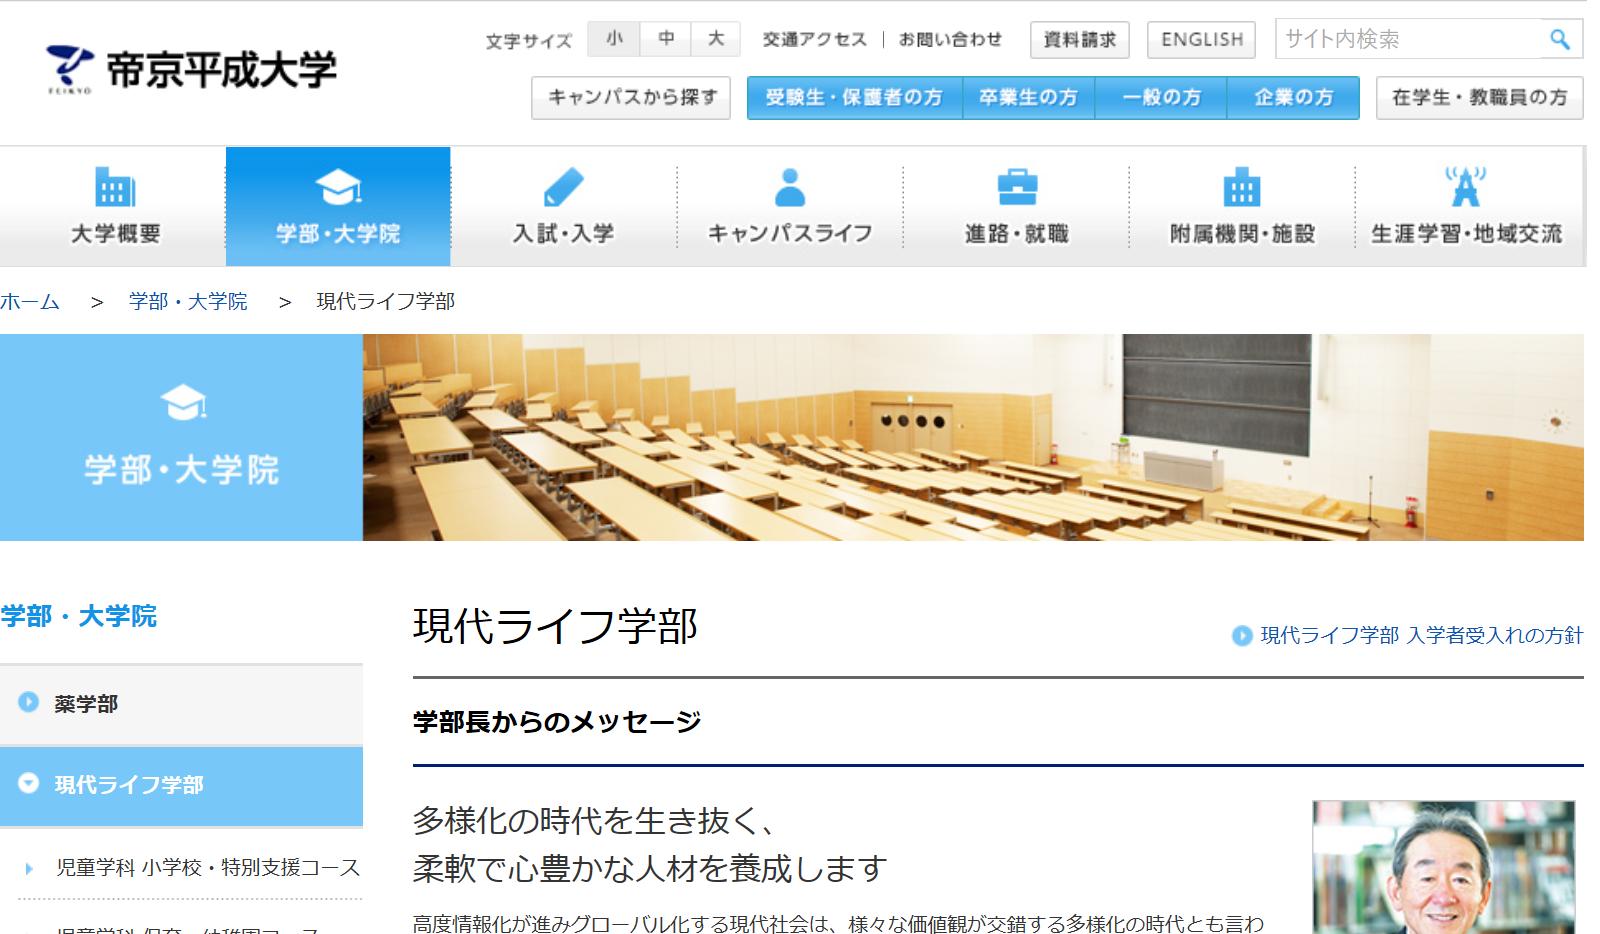 帝京平成大学の評判・口コミ【現代ライフ学部編】